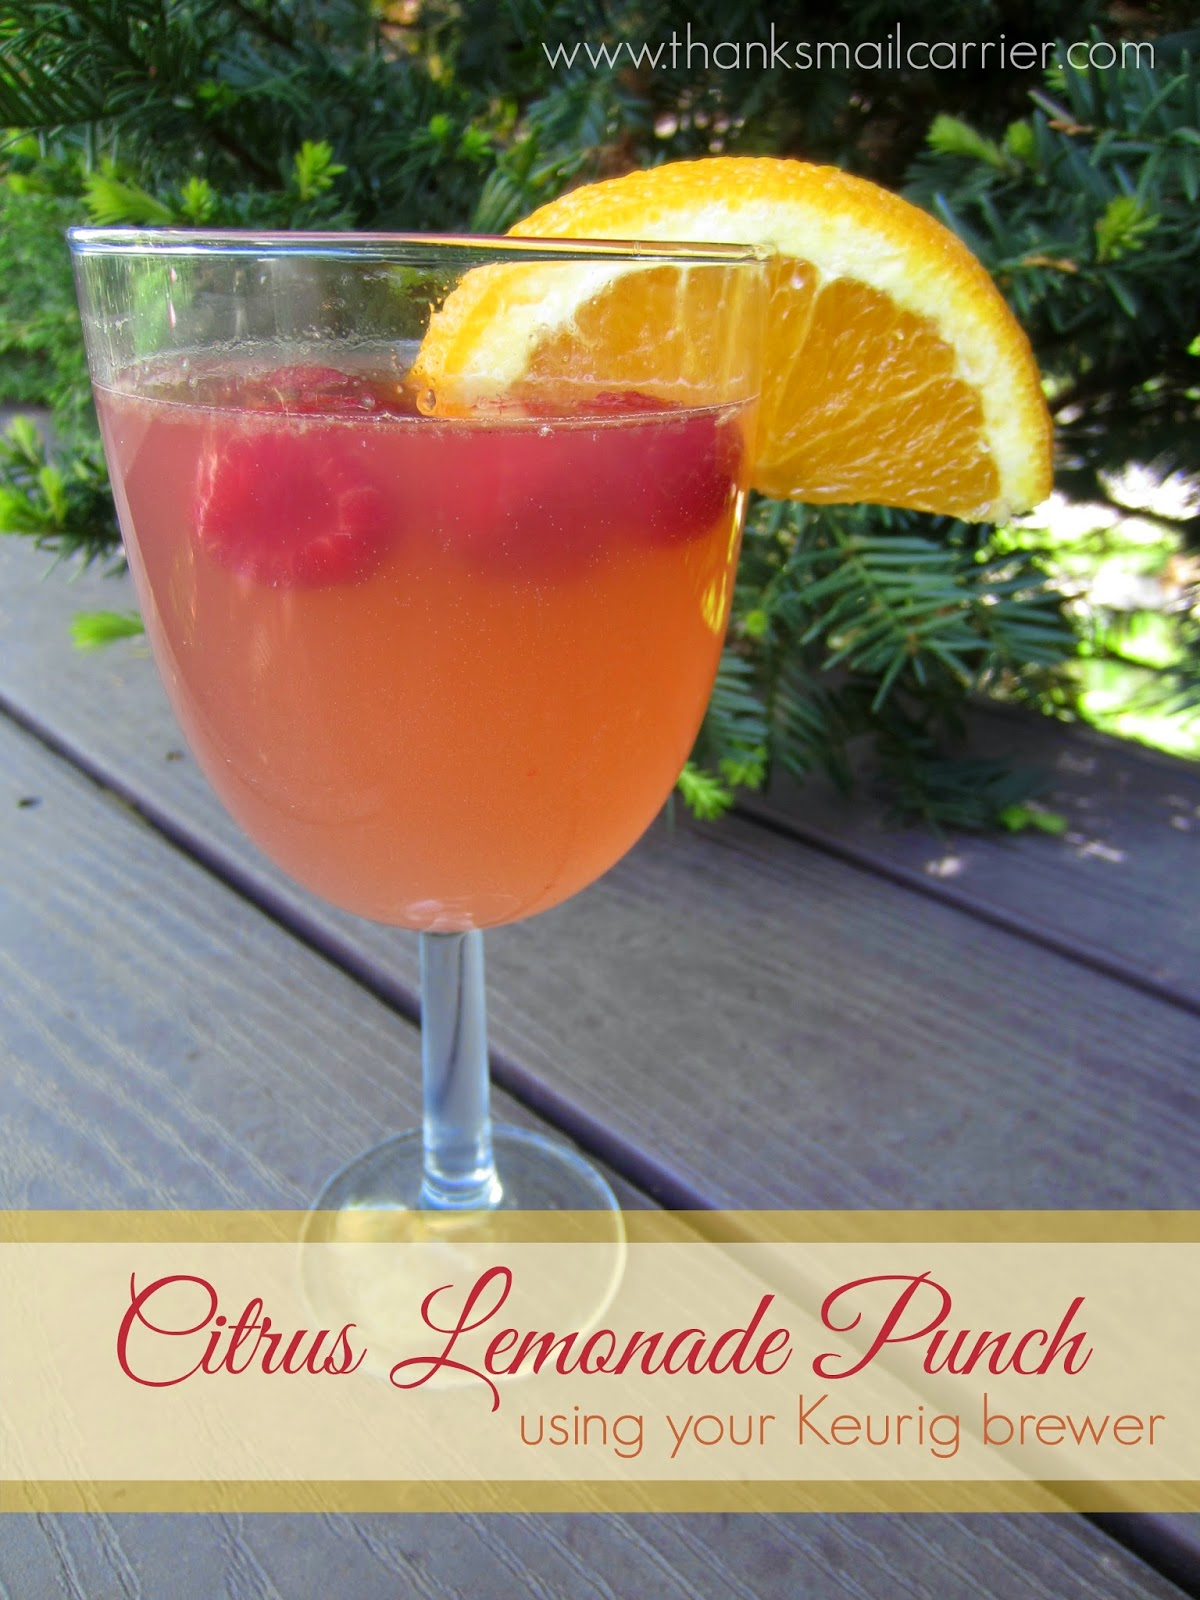 Citrus Lemonade Punch